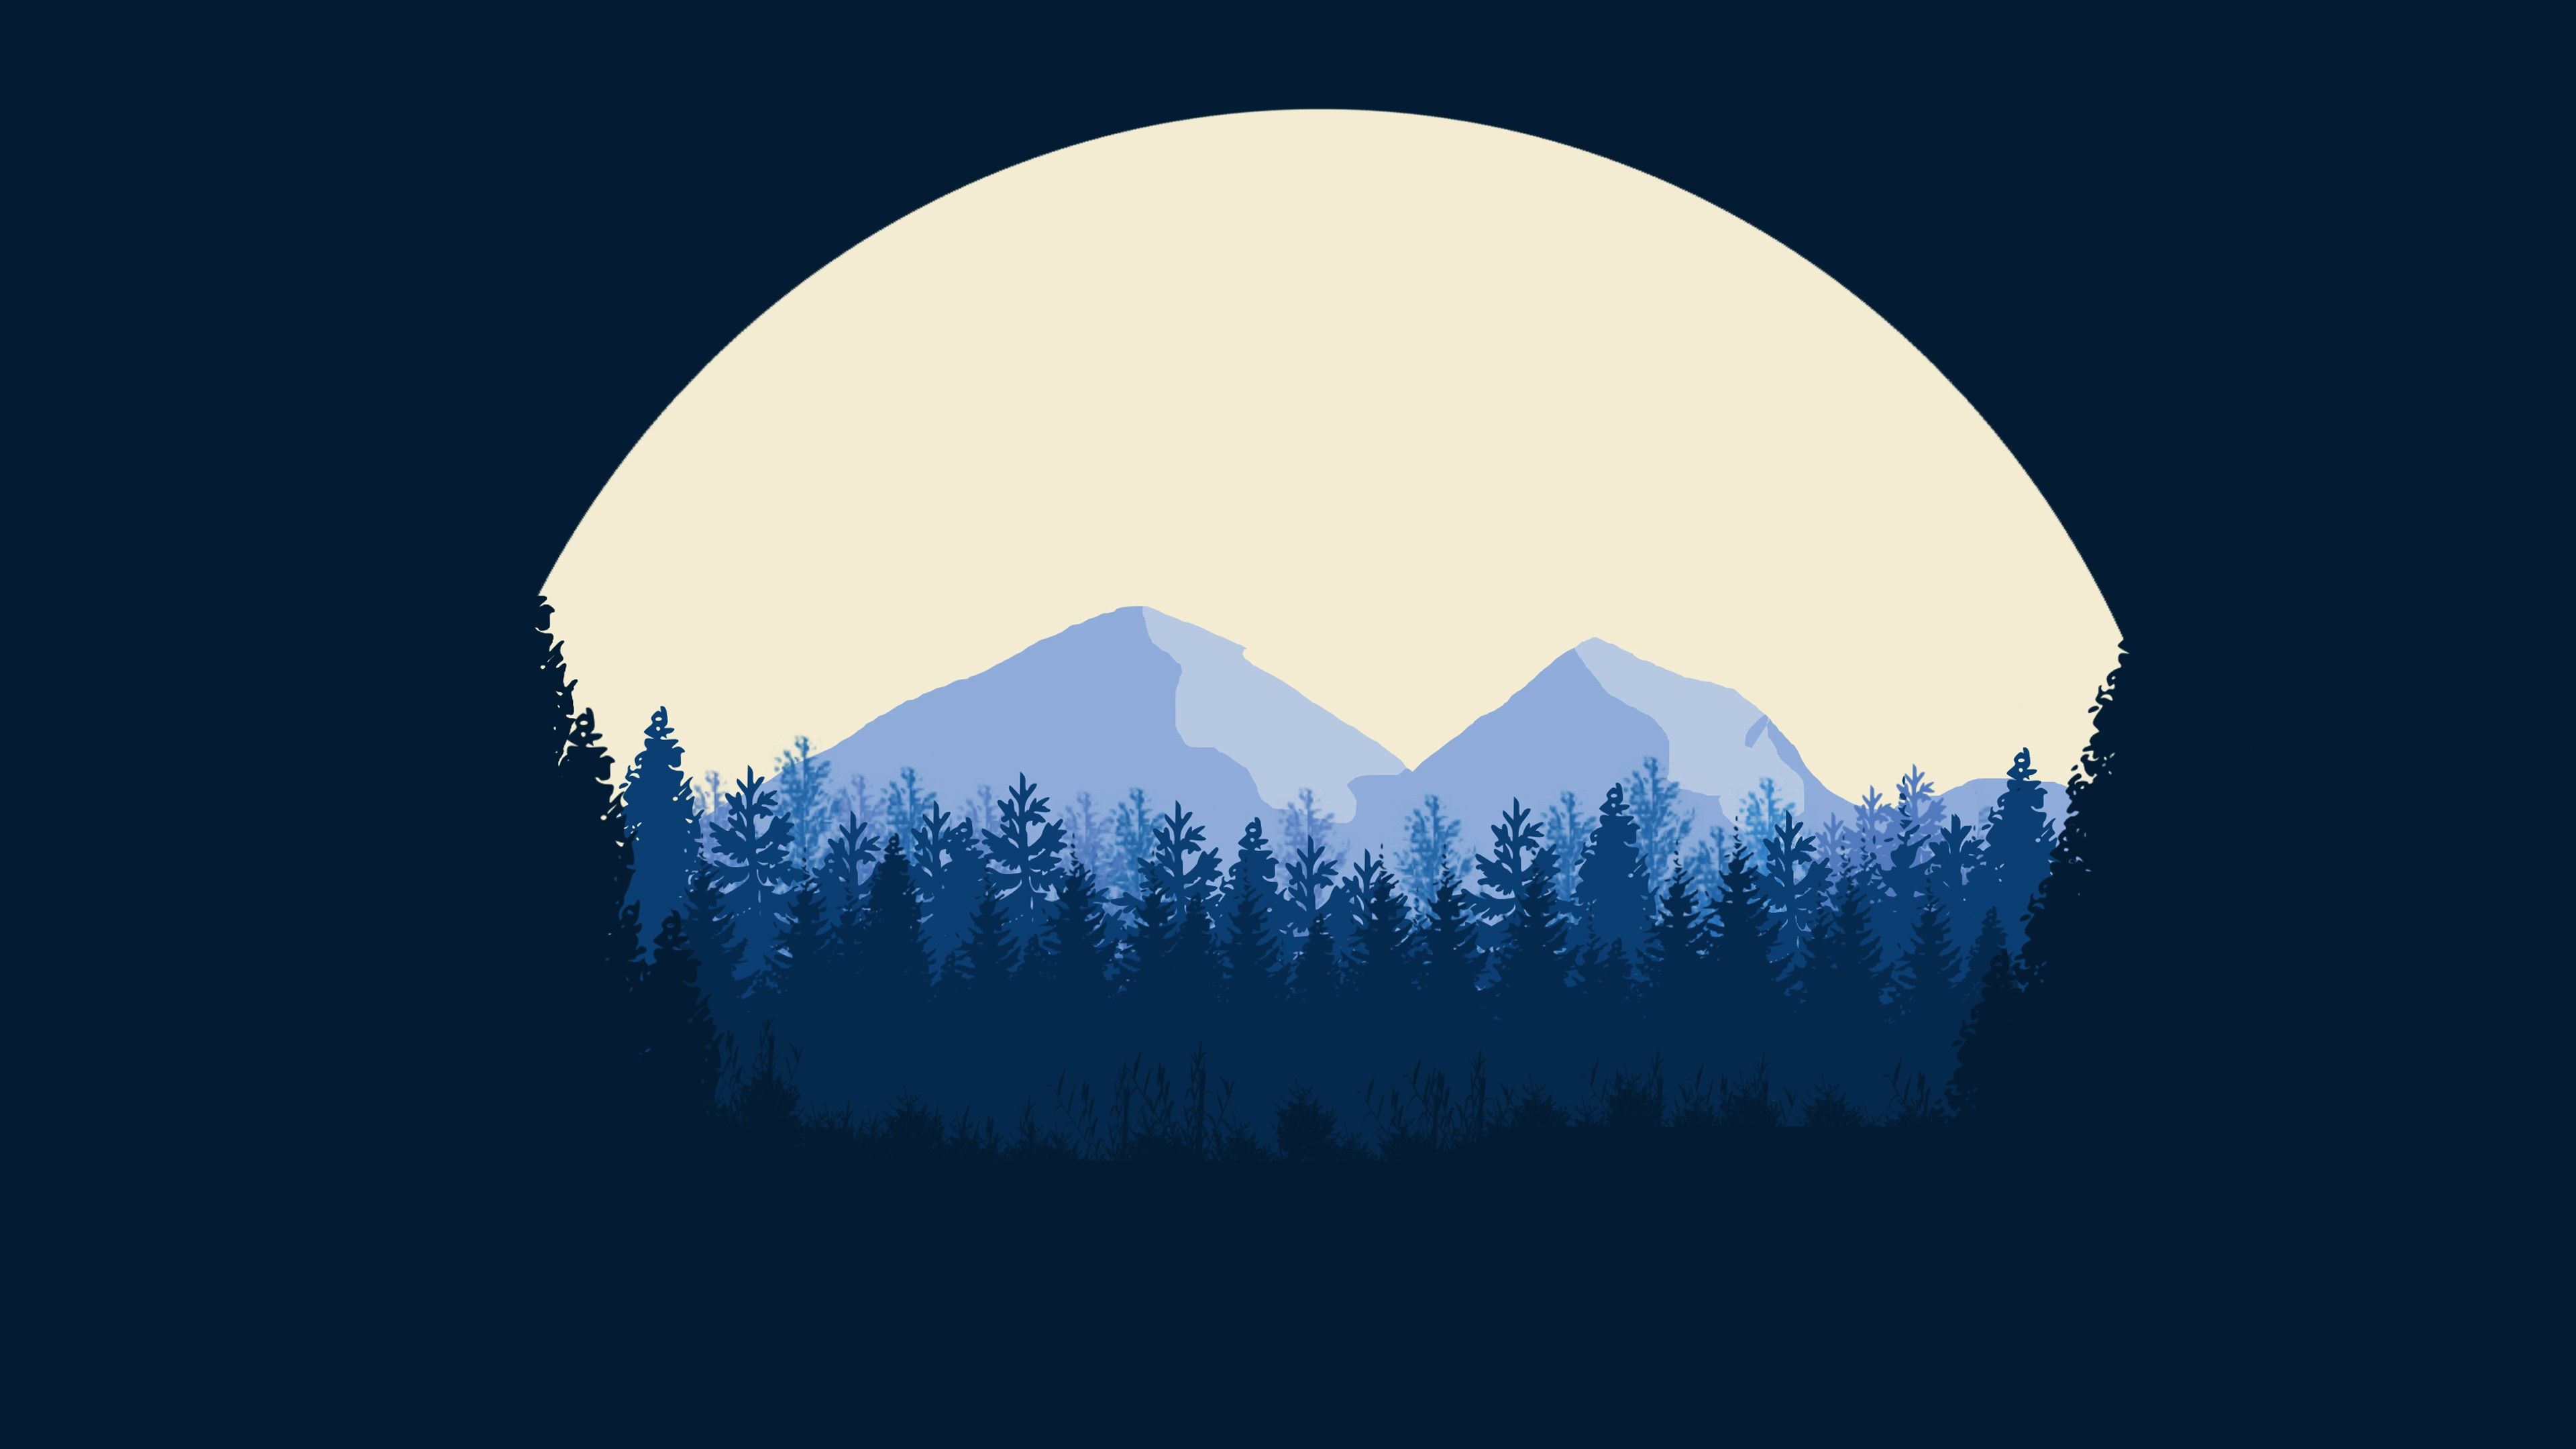 full moon forest flat wallpaper 4k by designuchiha on DeviantArt